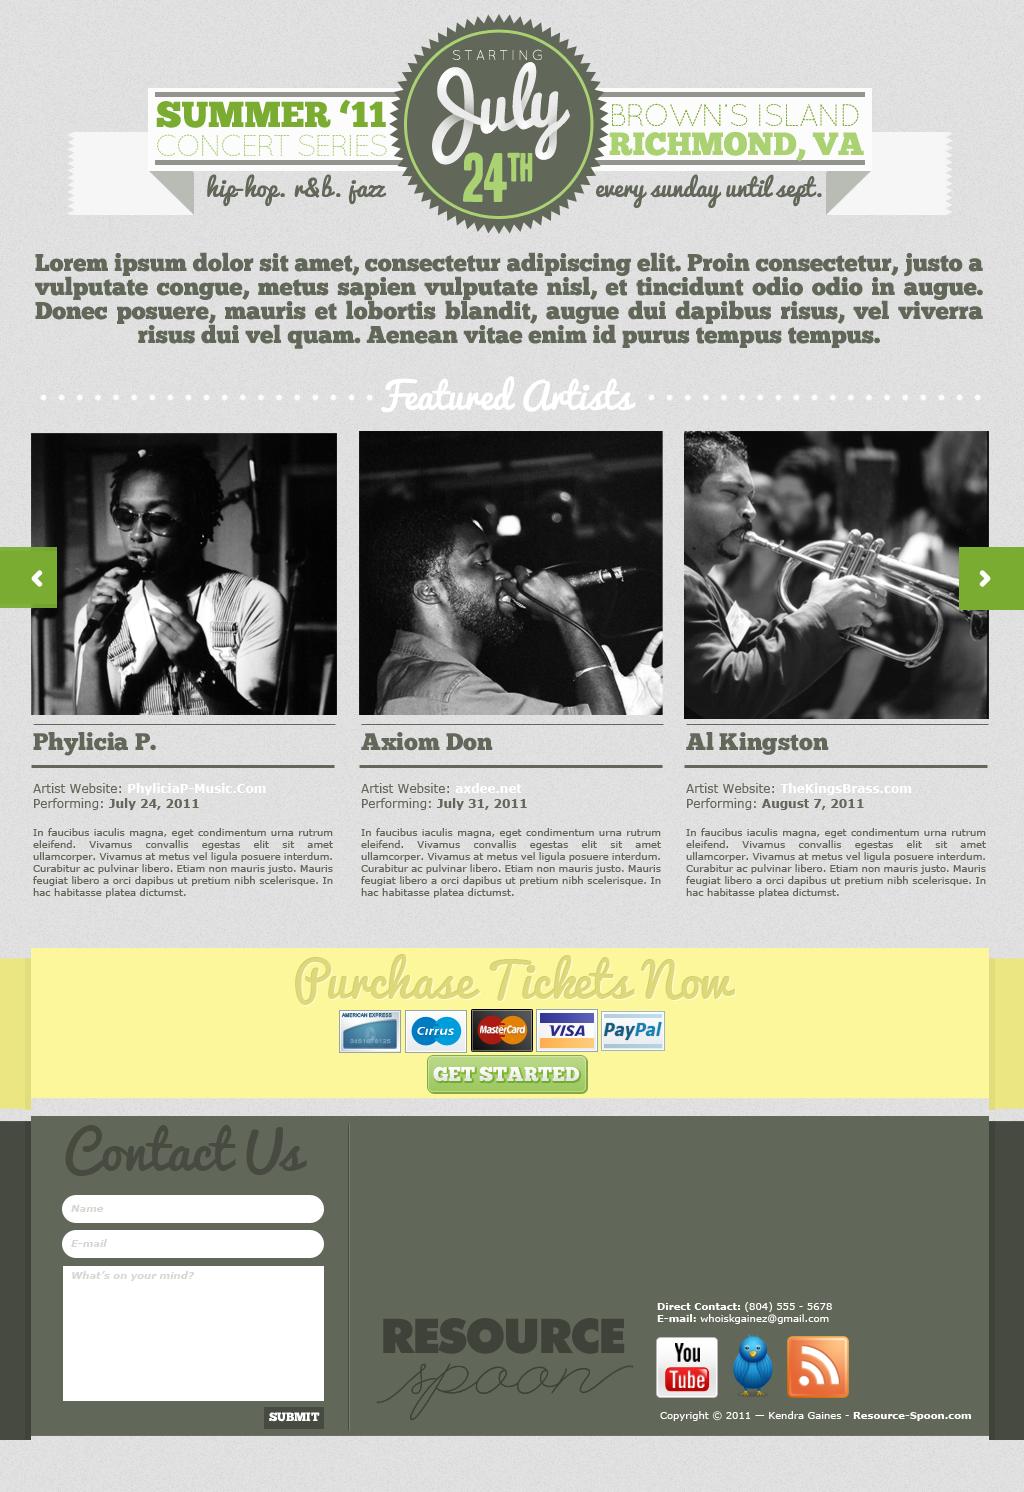 шаблон сайта ивенты, бесплатно, free psd site, green, silver